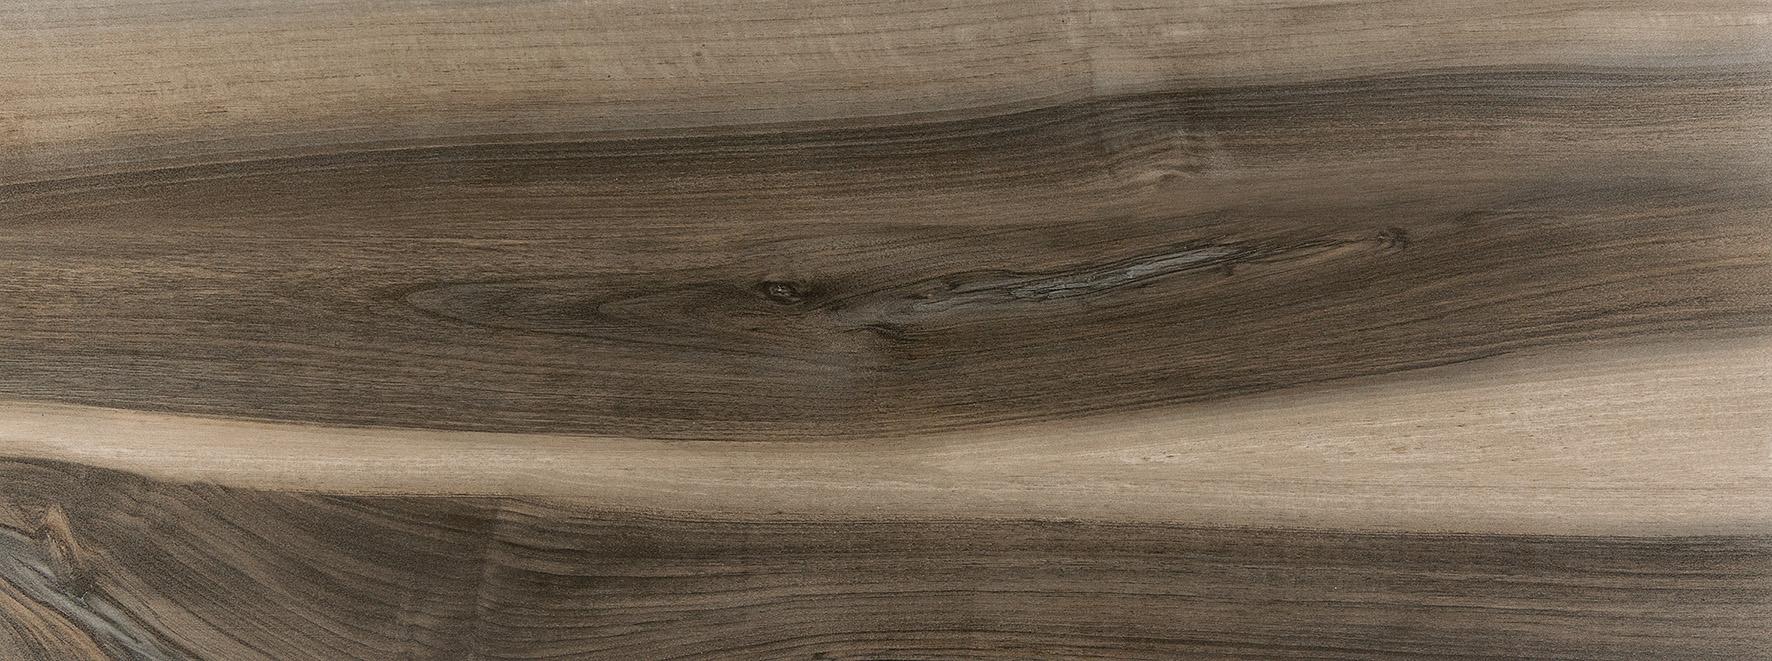 Купить Керамогранит Kutahya Kauri Brown 60x160, Турция